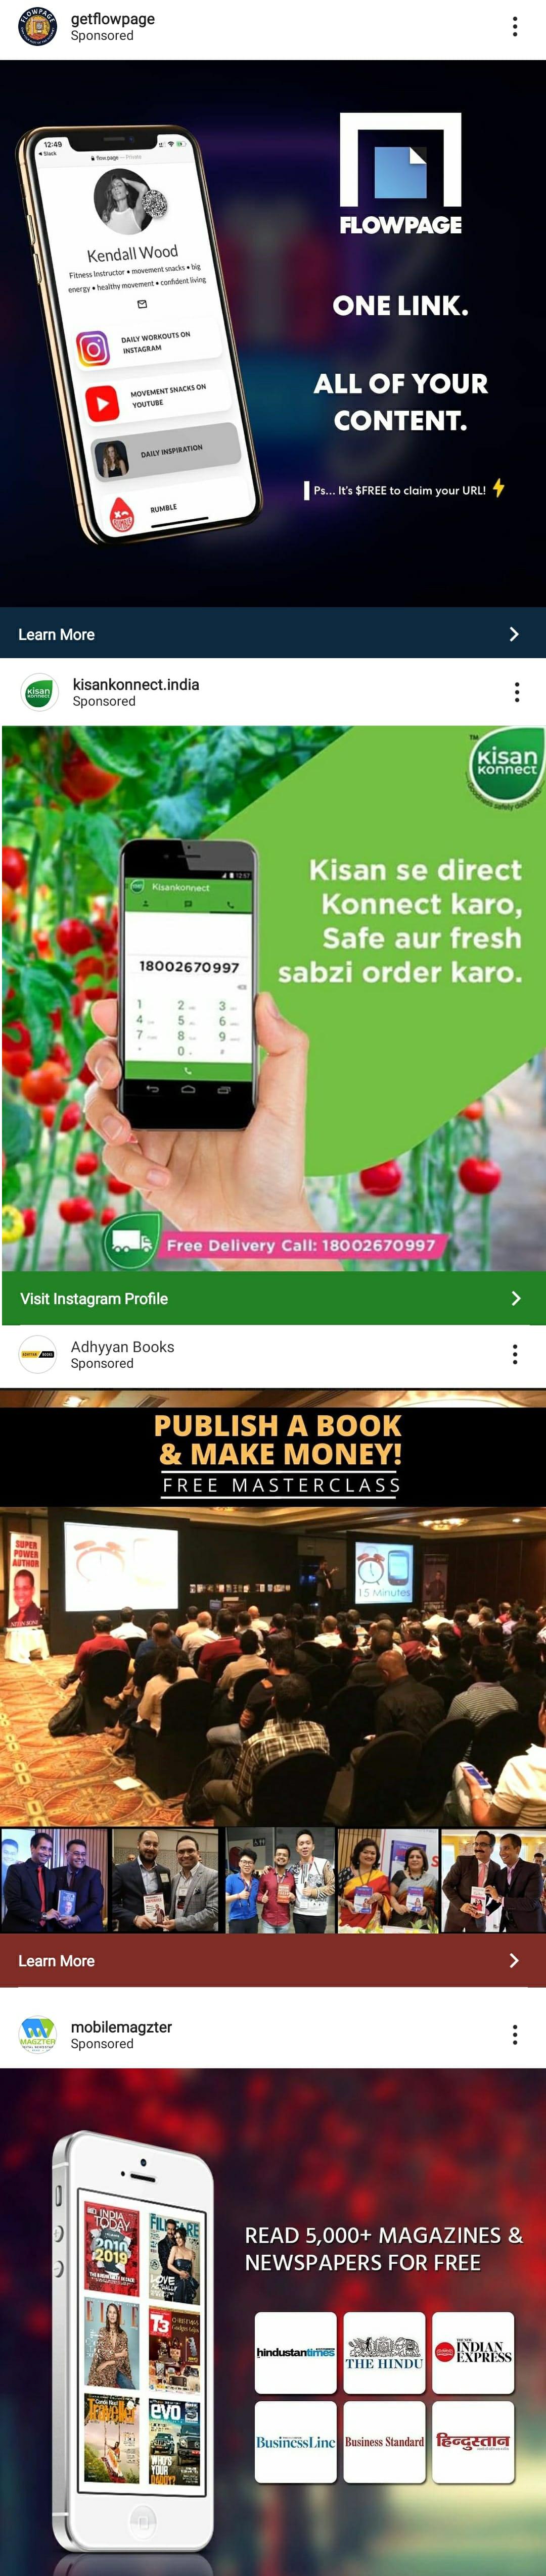 Instagram Ads Infographic